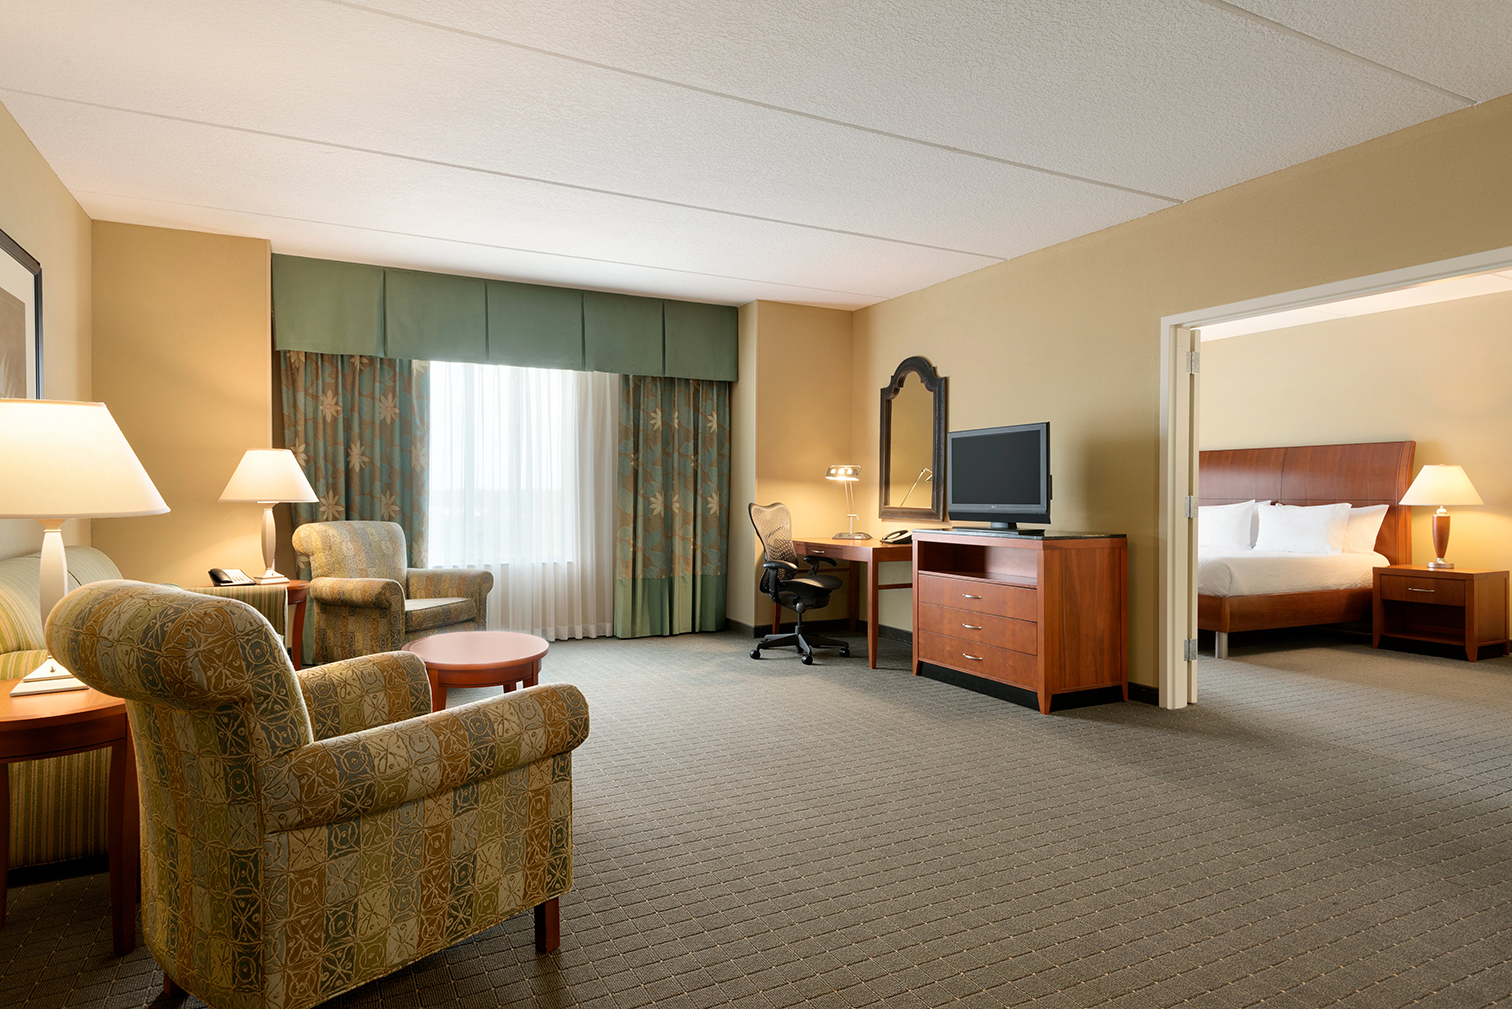 Hilton Garden Inn Palm Coast Town Center – 1 King Bed 1 Bedroom Suite – 1056552